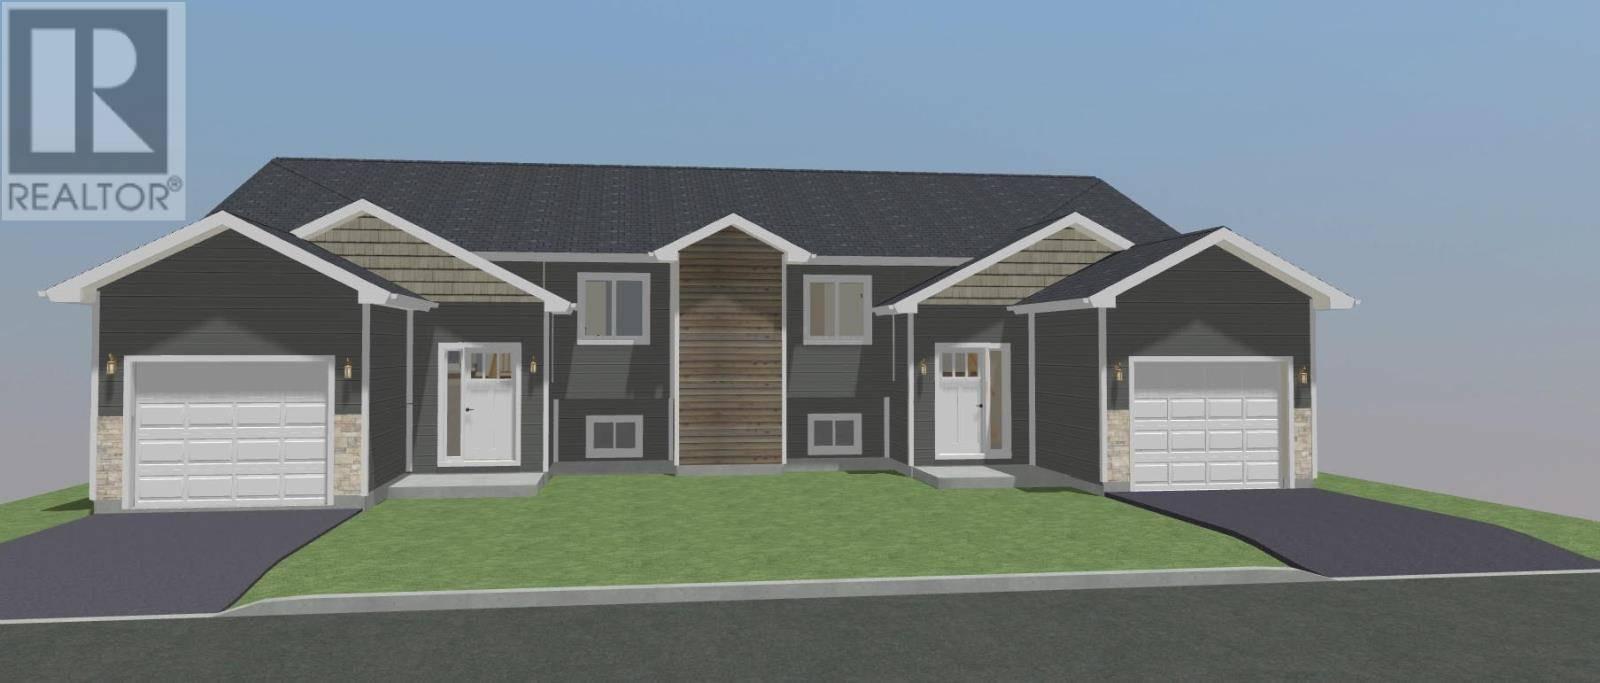 House for sale at 3 Chloe Pl St. Thomas - Paradise Newfoundland - MLS: 1205096